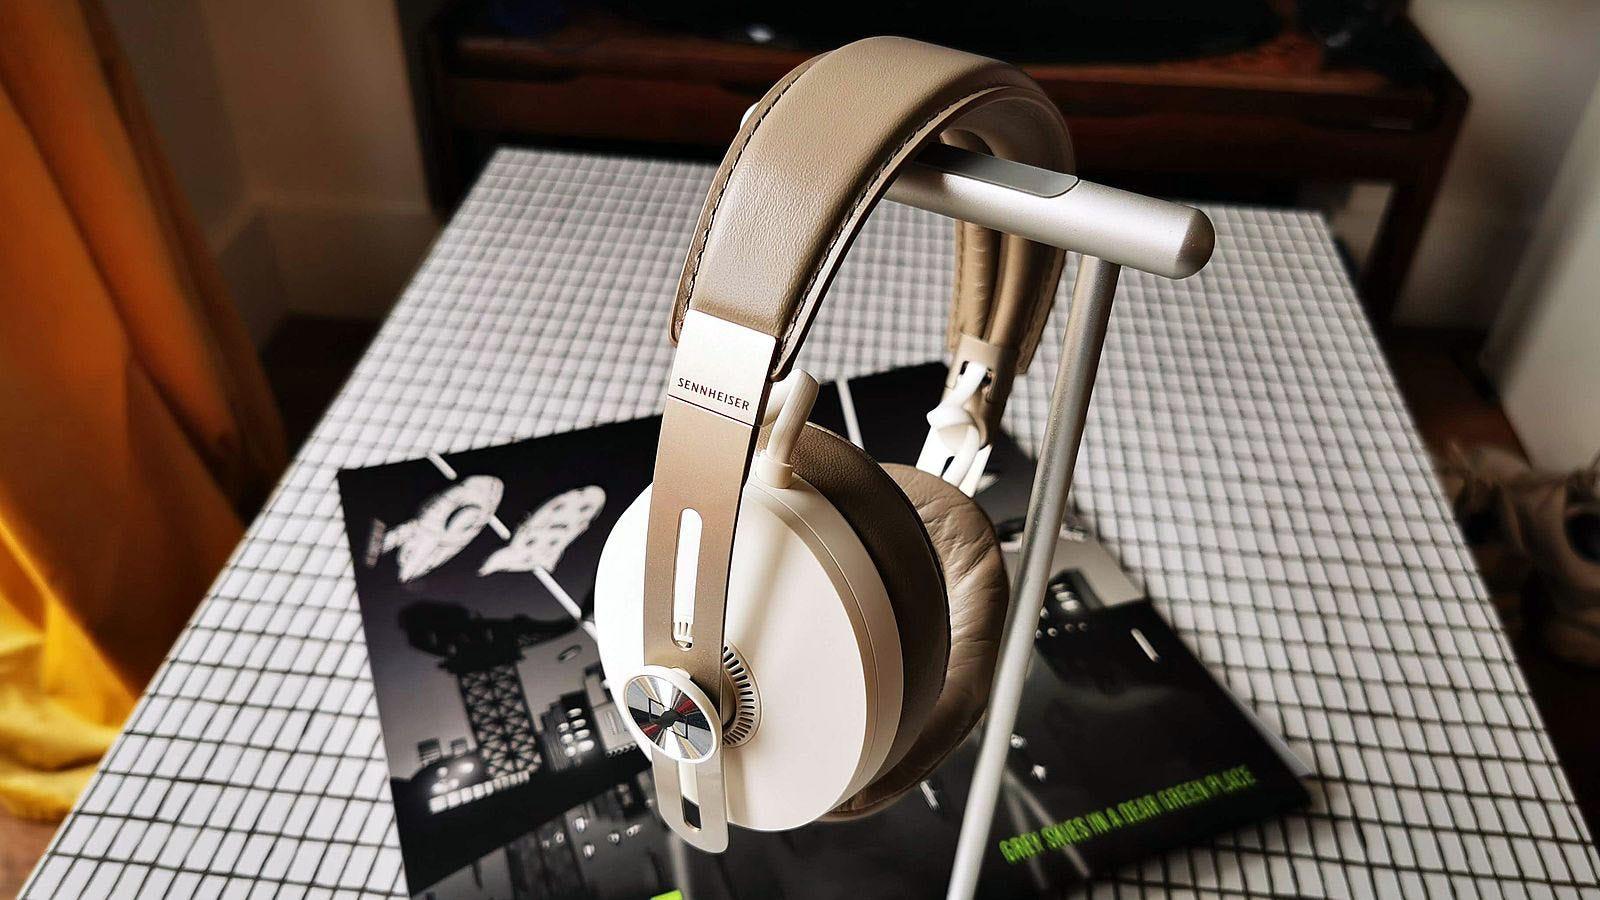 momentum 3 headphones on headphone stand